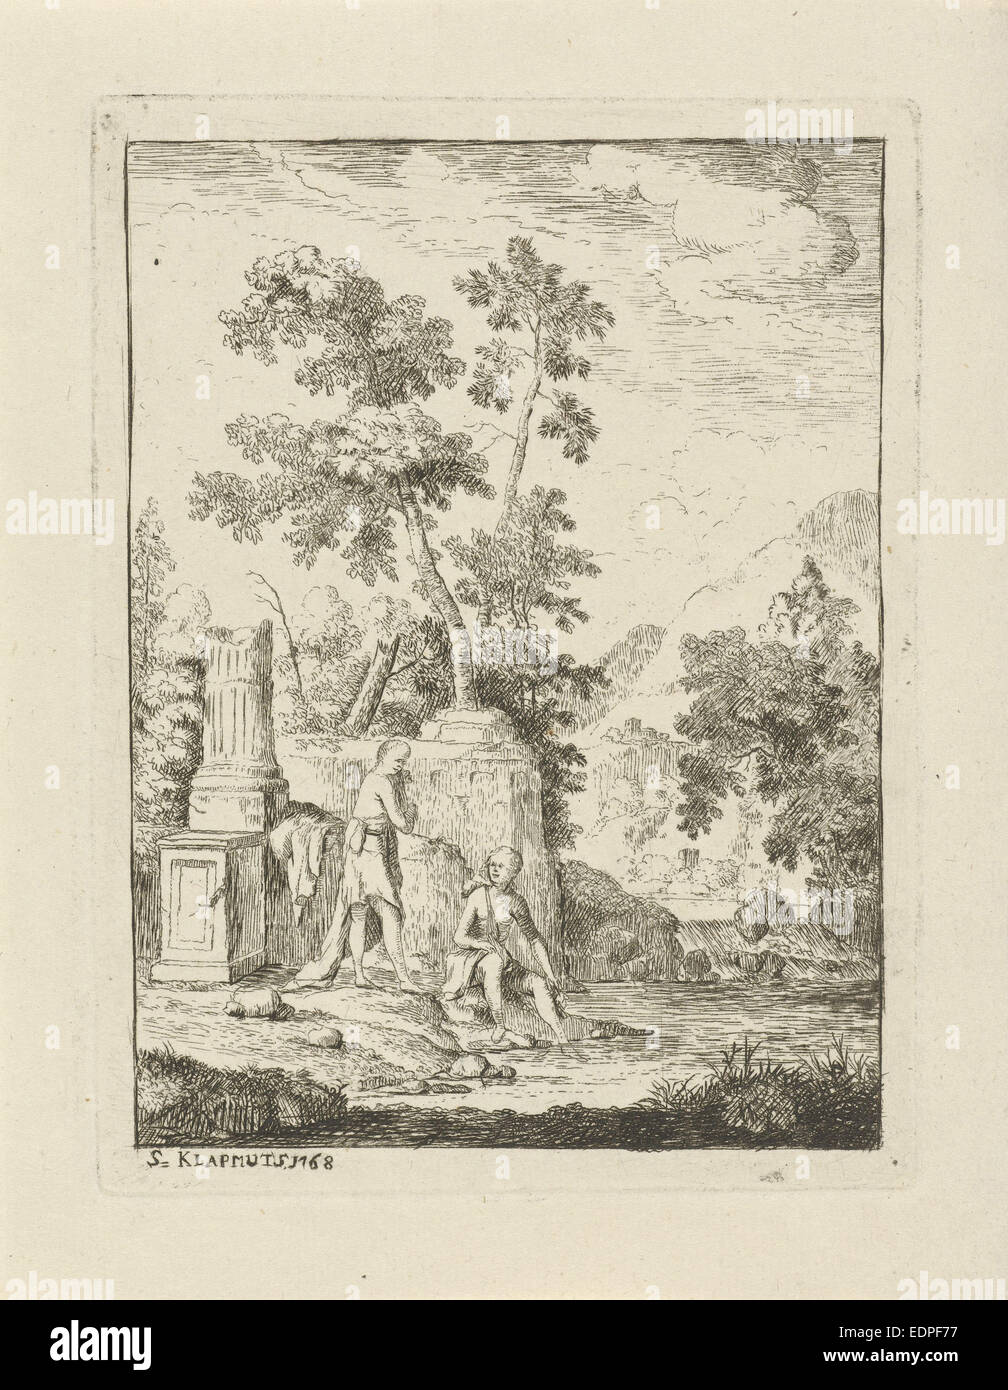 Bathing girls, Simon Klapmuts, 1768 - Stock Image